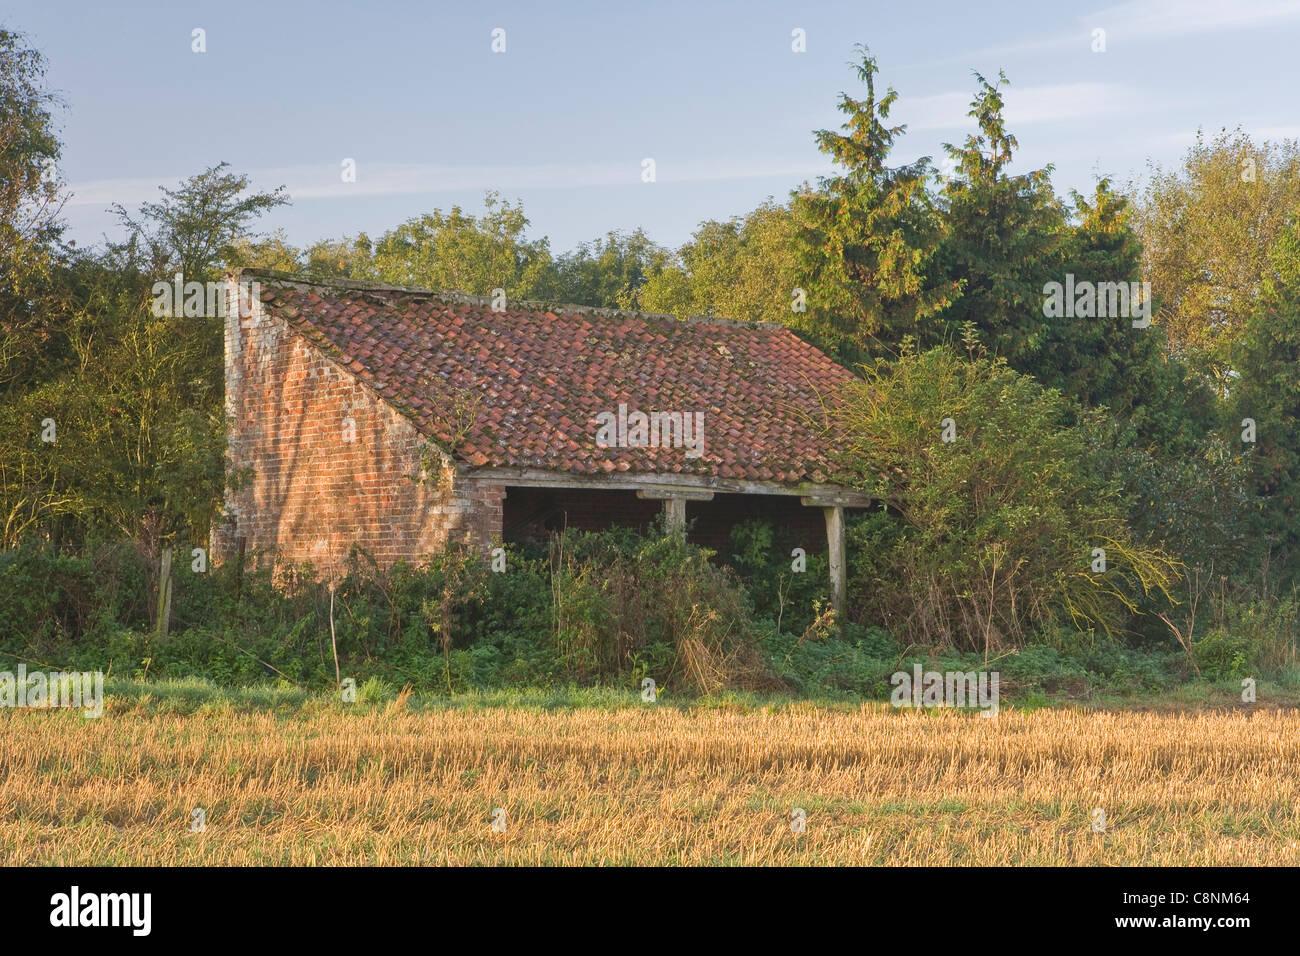 Old Farm Building Stock Photo